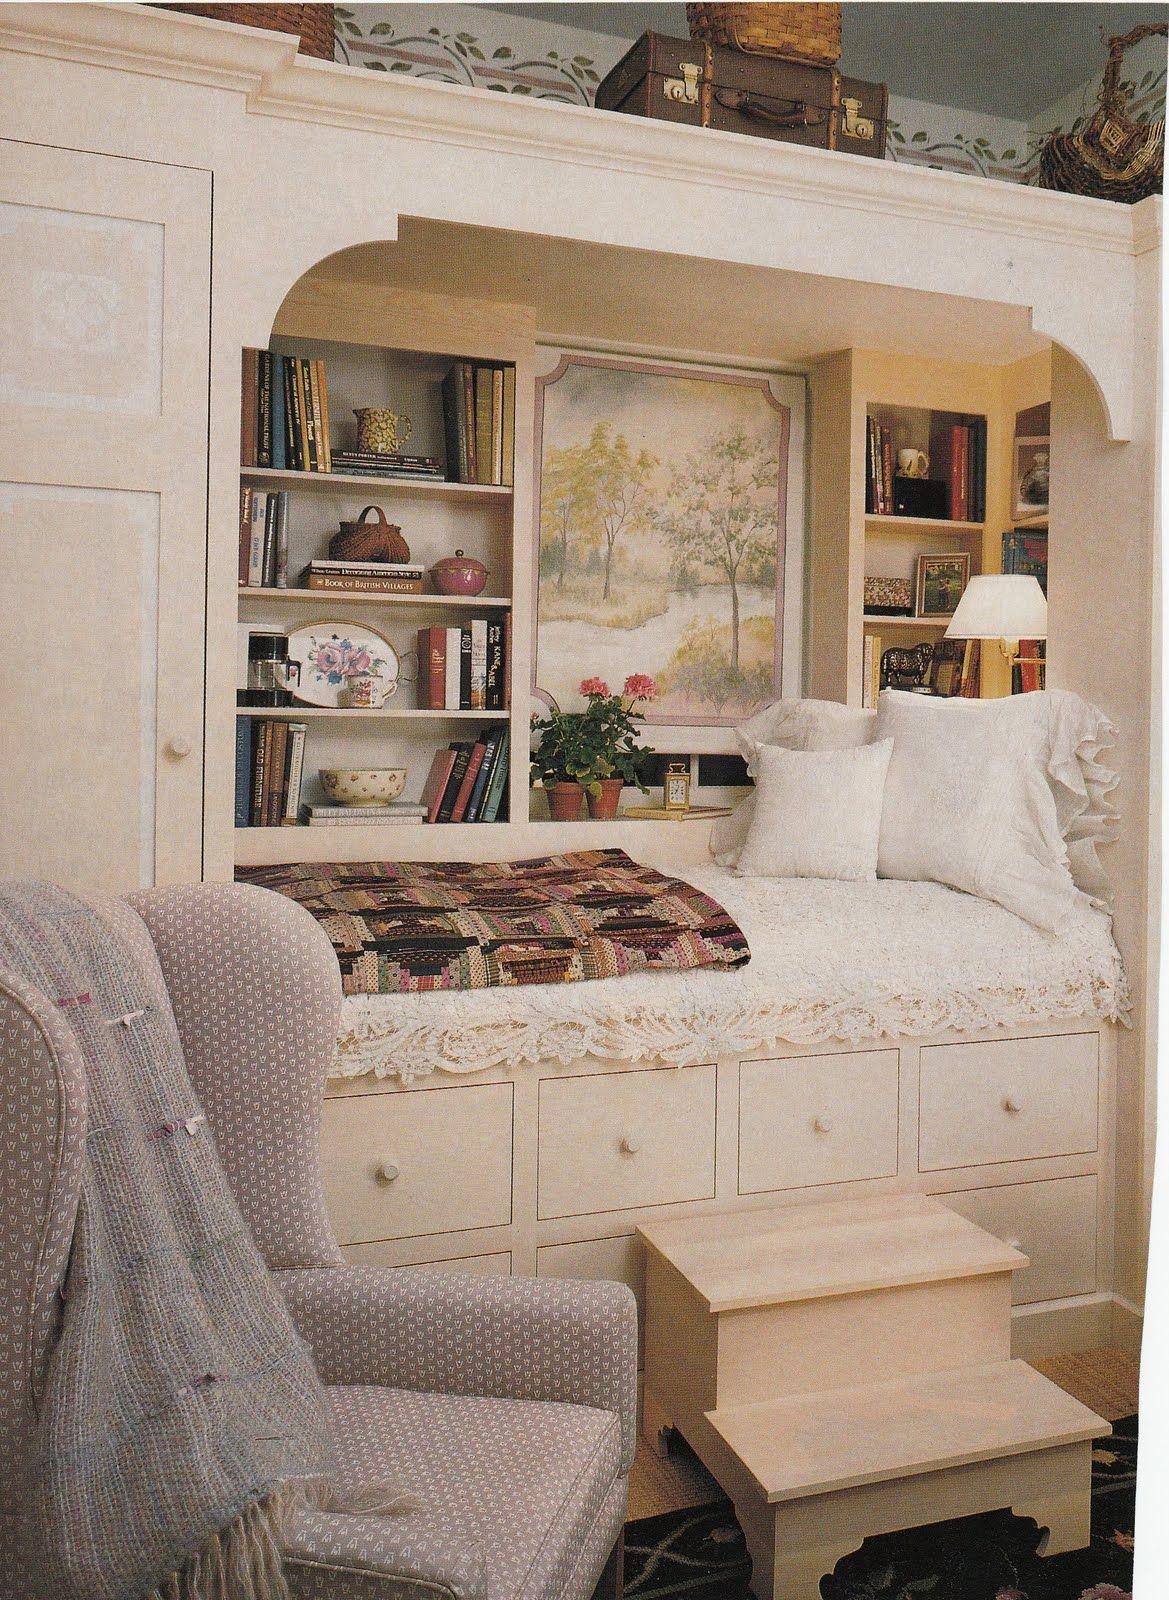 Hydrangea Hill Cottage Sleeping Quarters Home bedroom